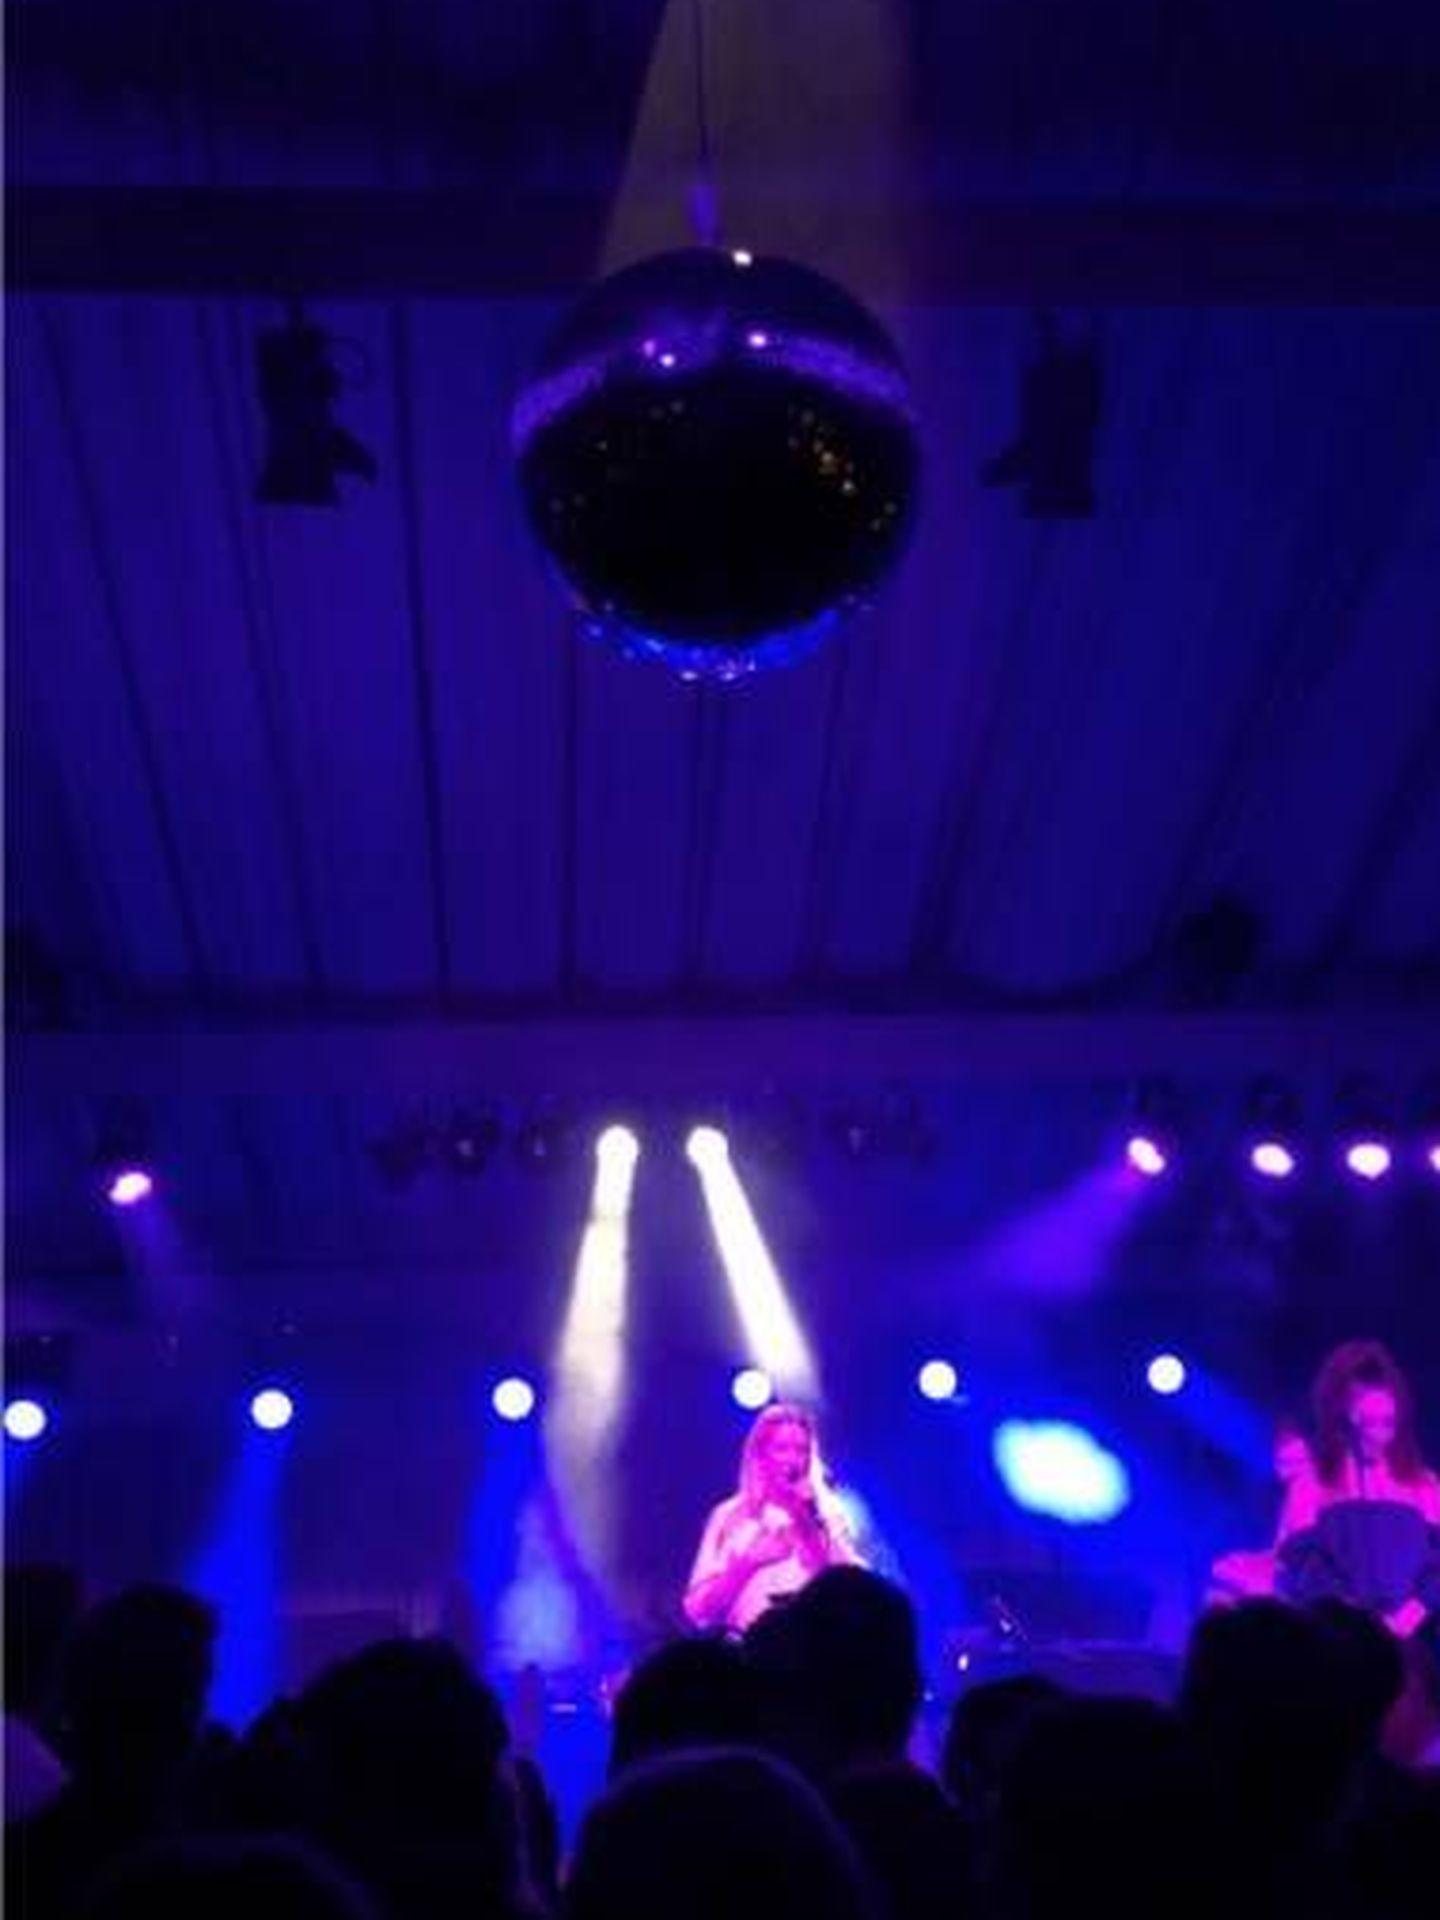 Goulding se arrancó a dar un mini concierto. (Instagram @jc_jonathancheung)